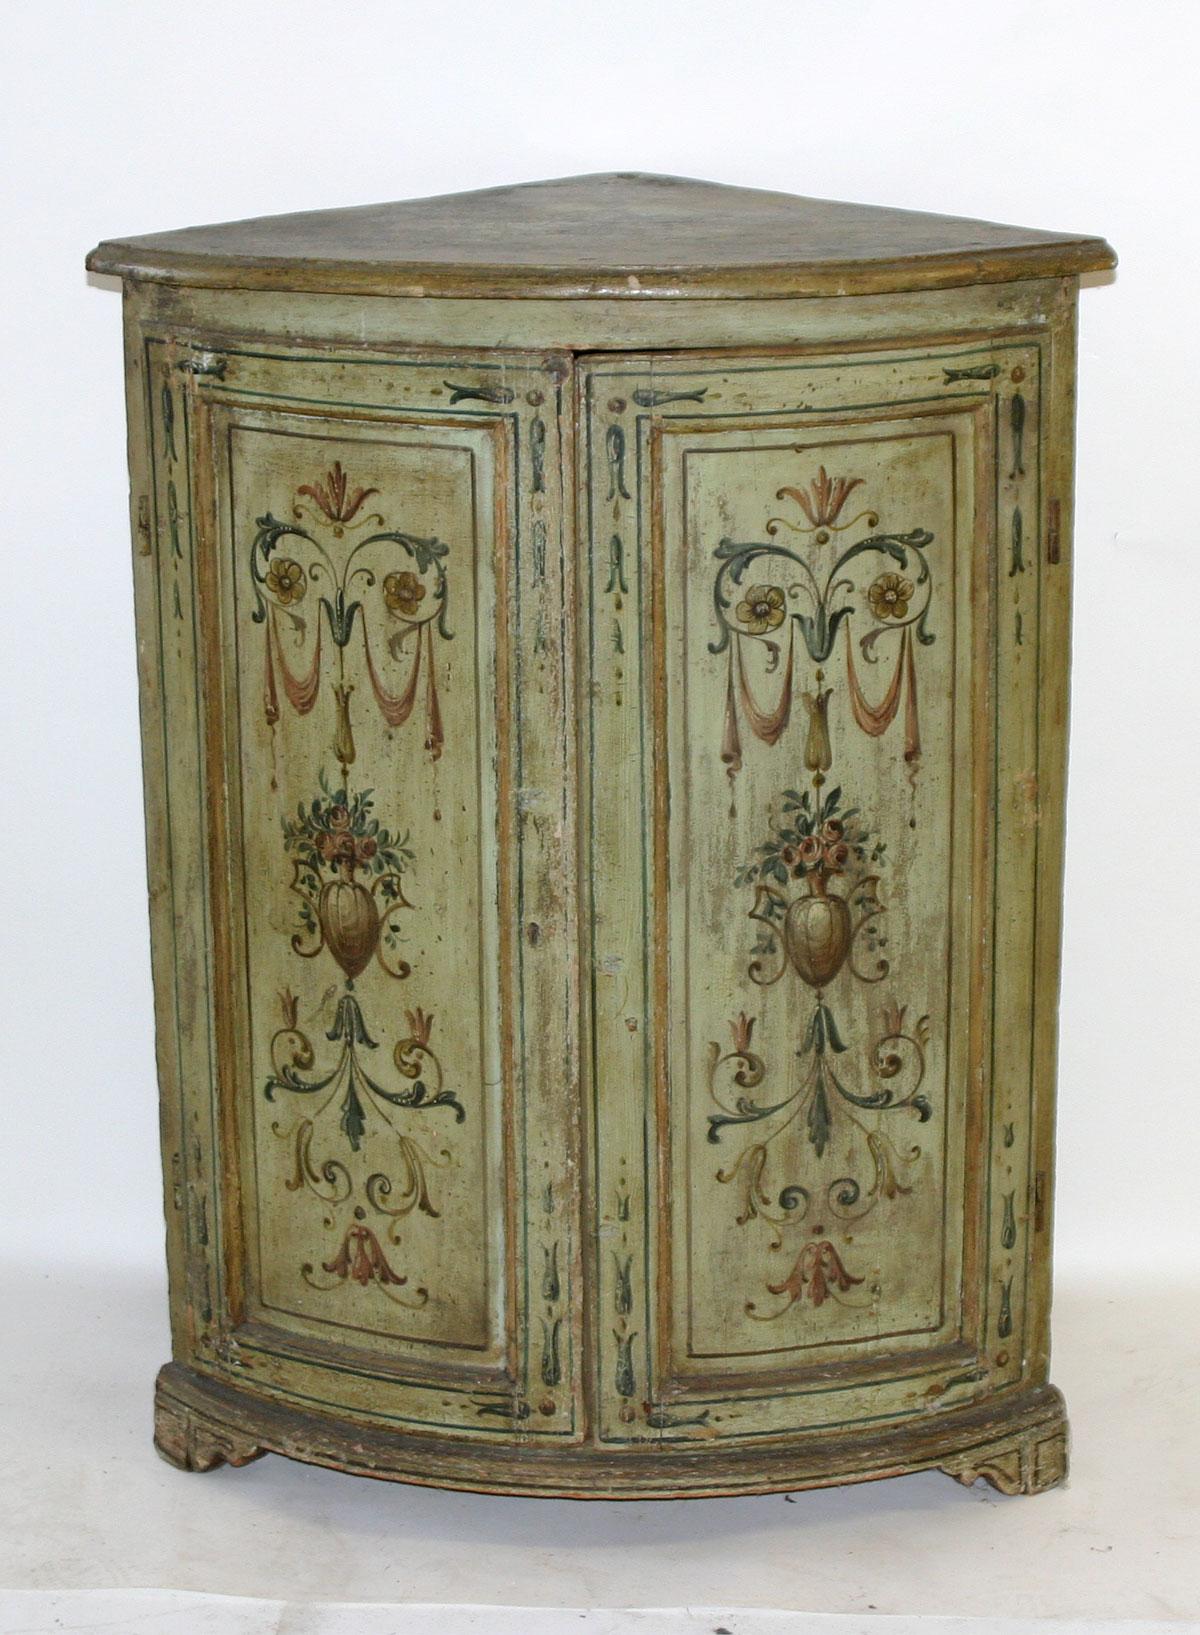 Pair of Italian, Neoclassical, painted corner cabinets - For Sale - Pair Of Italian, Neoclassical, Painted Corner Cabinets For Sale